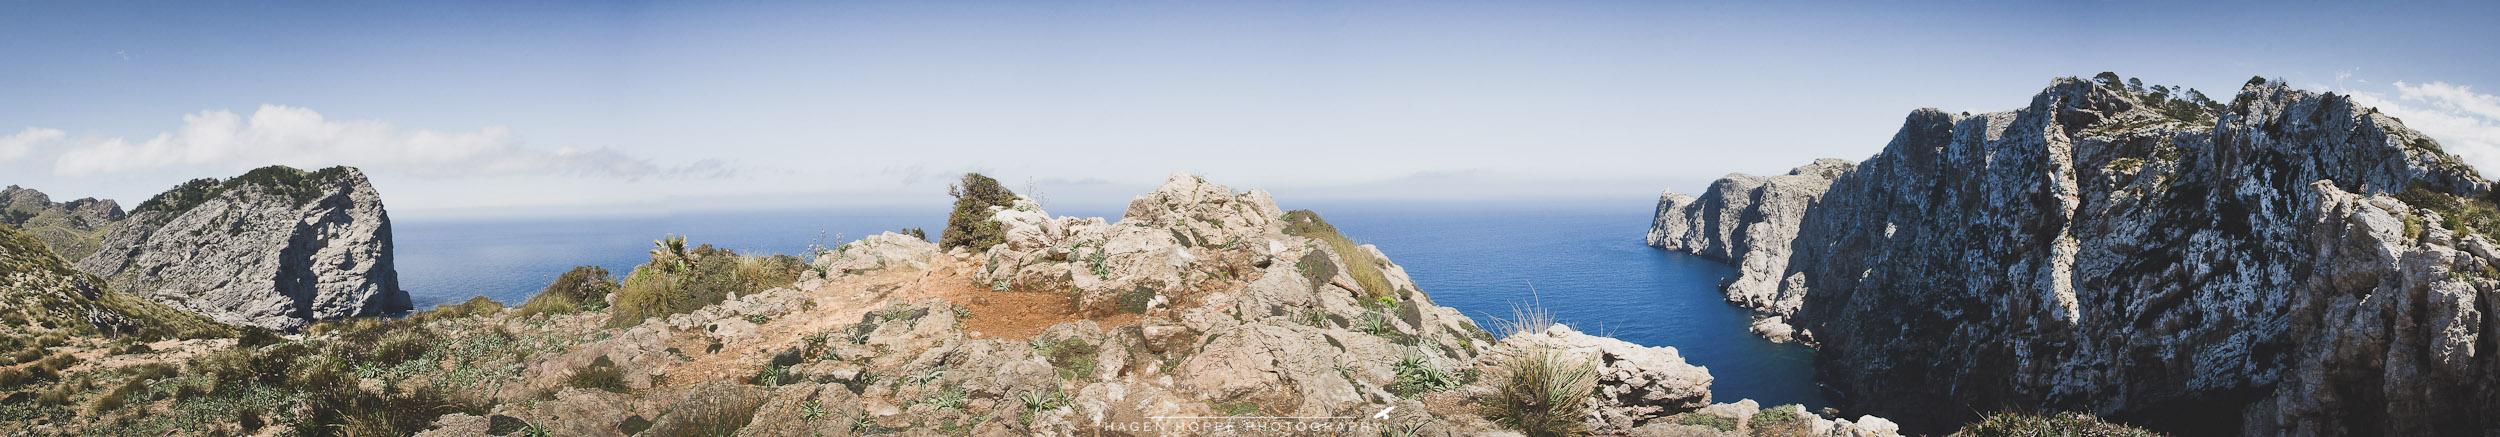 2014-04_panorama_mallorca_07